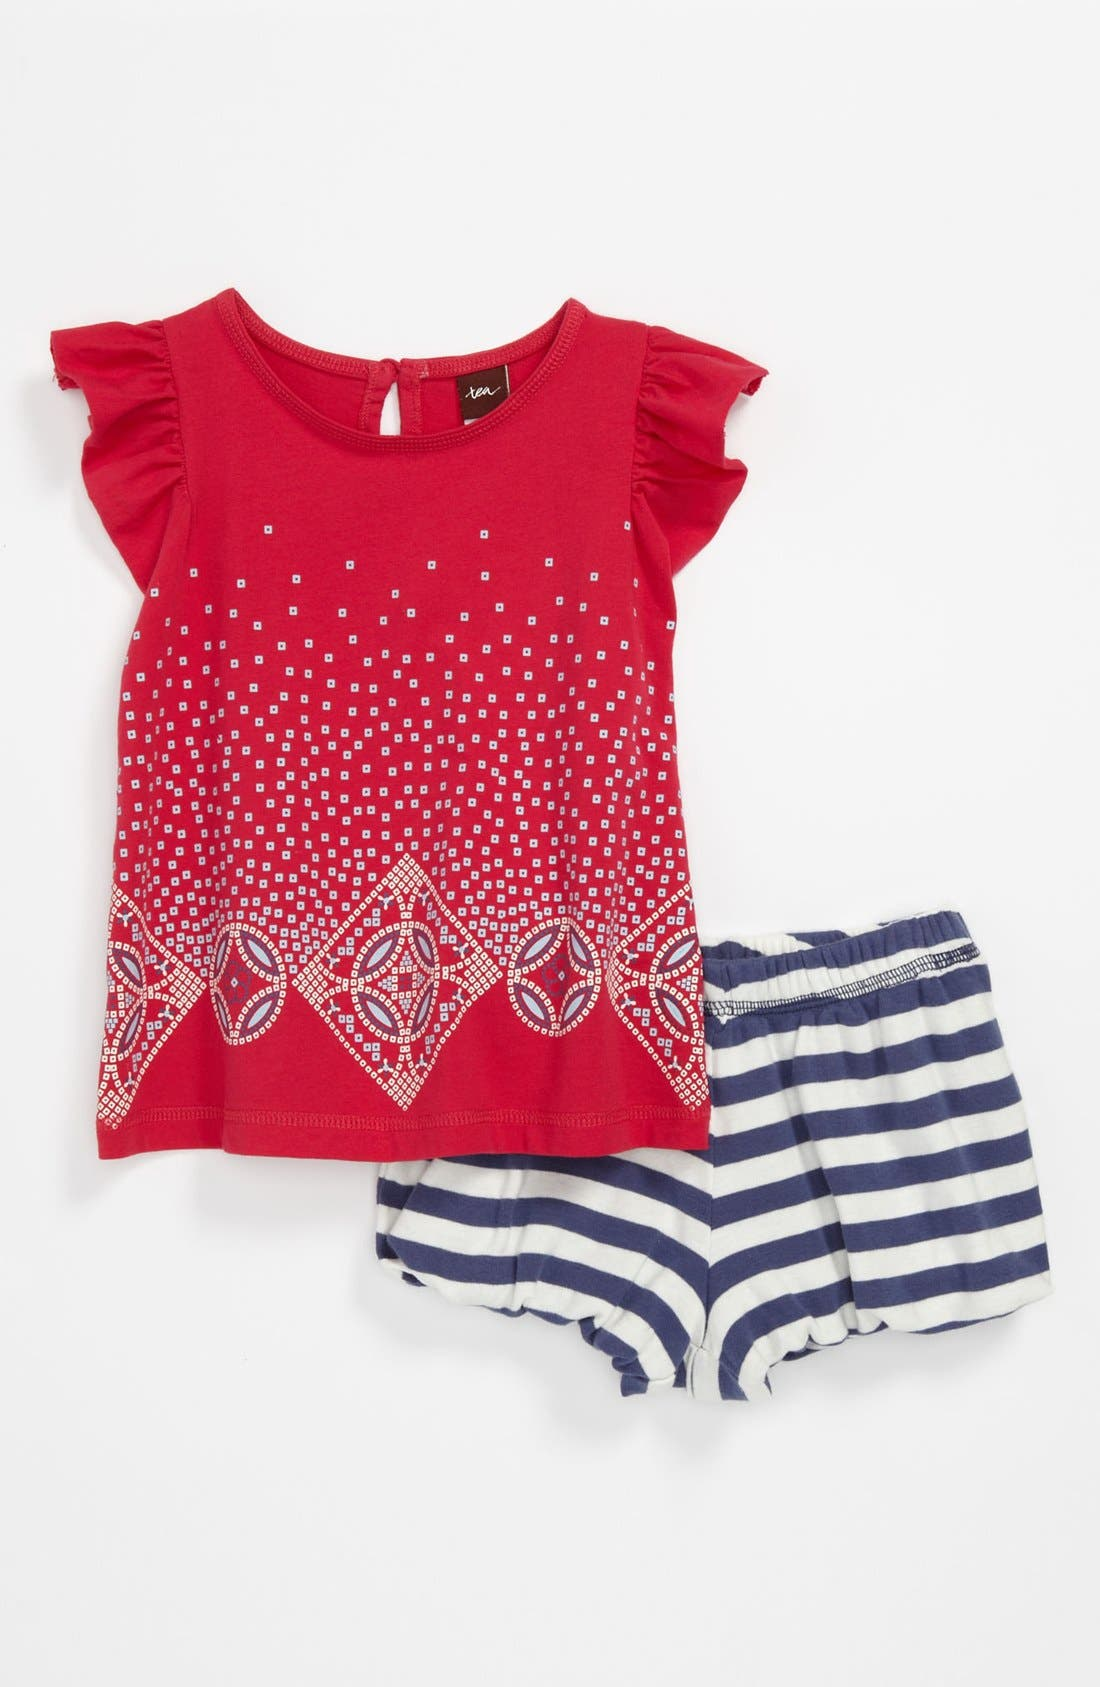 Main Image - Tea Collection 'Litema' Top & Shorts (Baby)